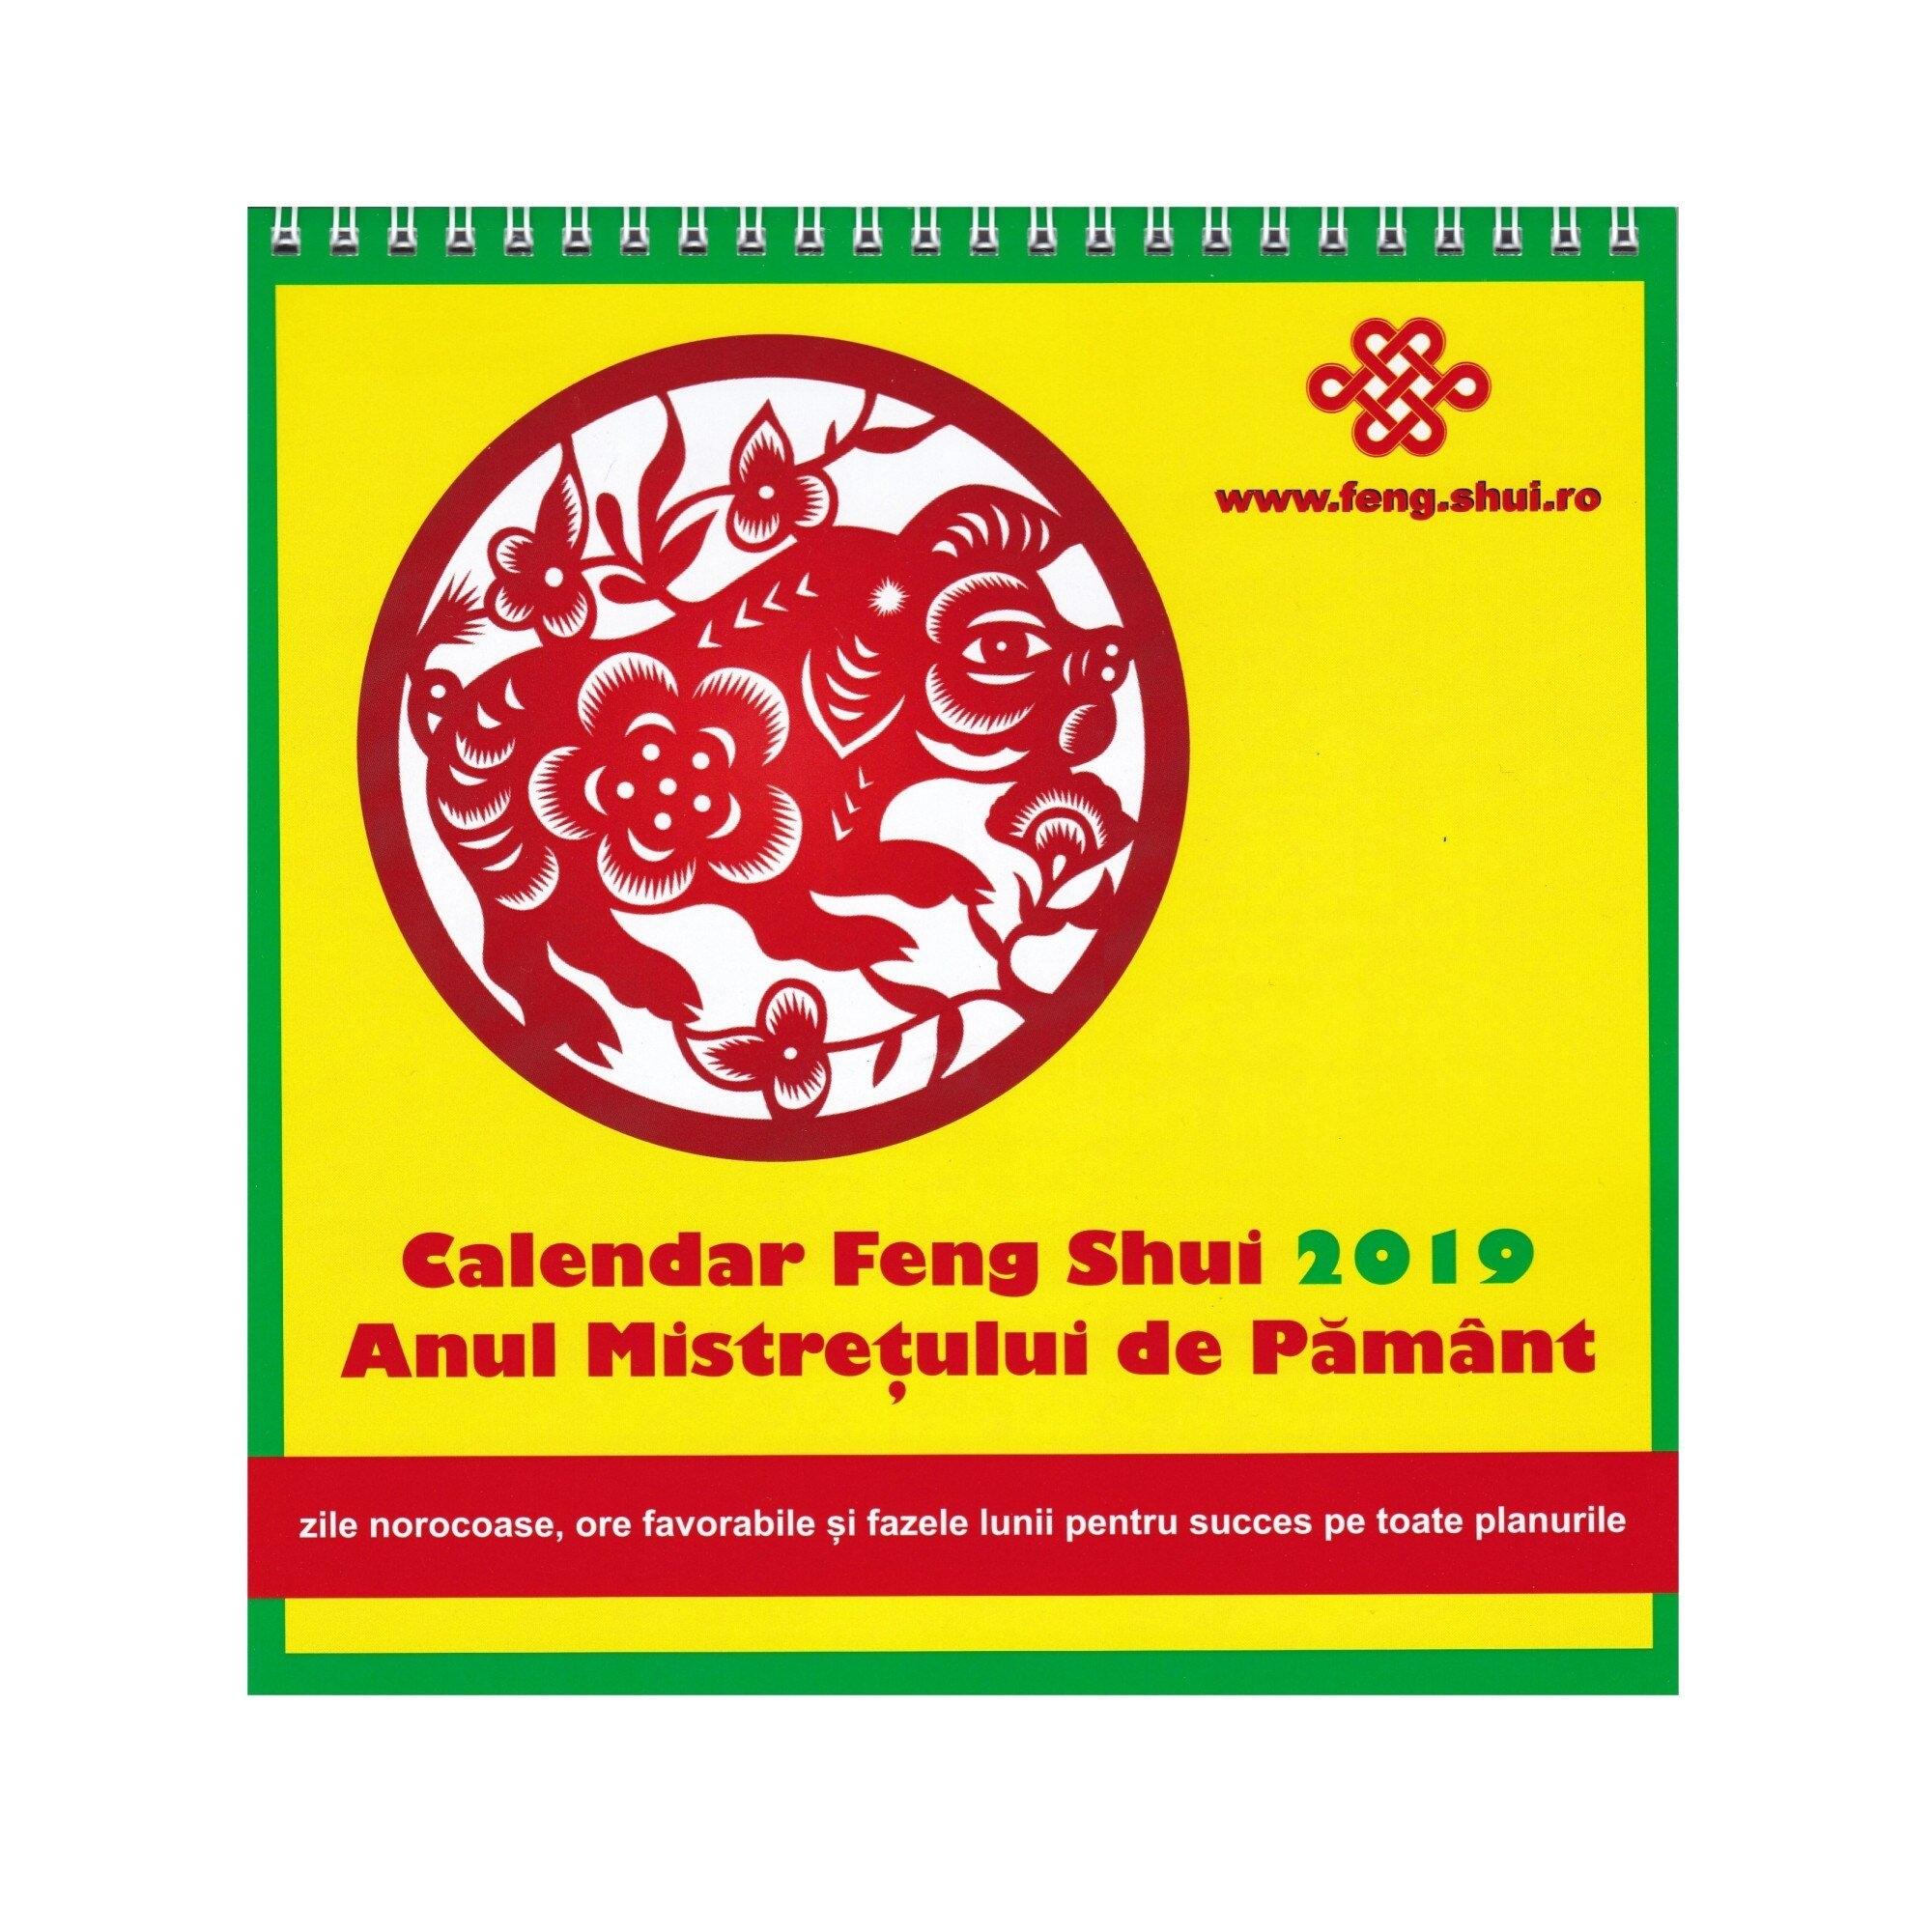 Calendar Feng Shui 2019 - Limba Romana, Multicolor, 20 X 20 Cm, 15 Pagini - Emag.ro inside Calendar 2021 In Limba Romana Image